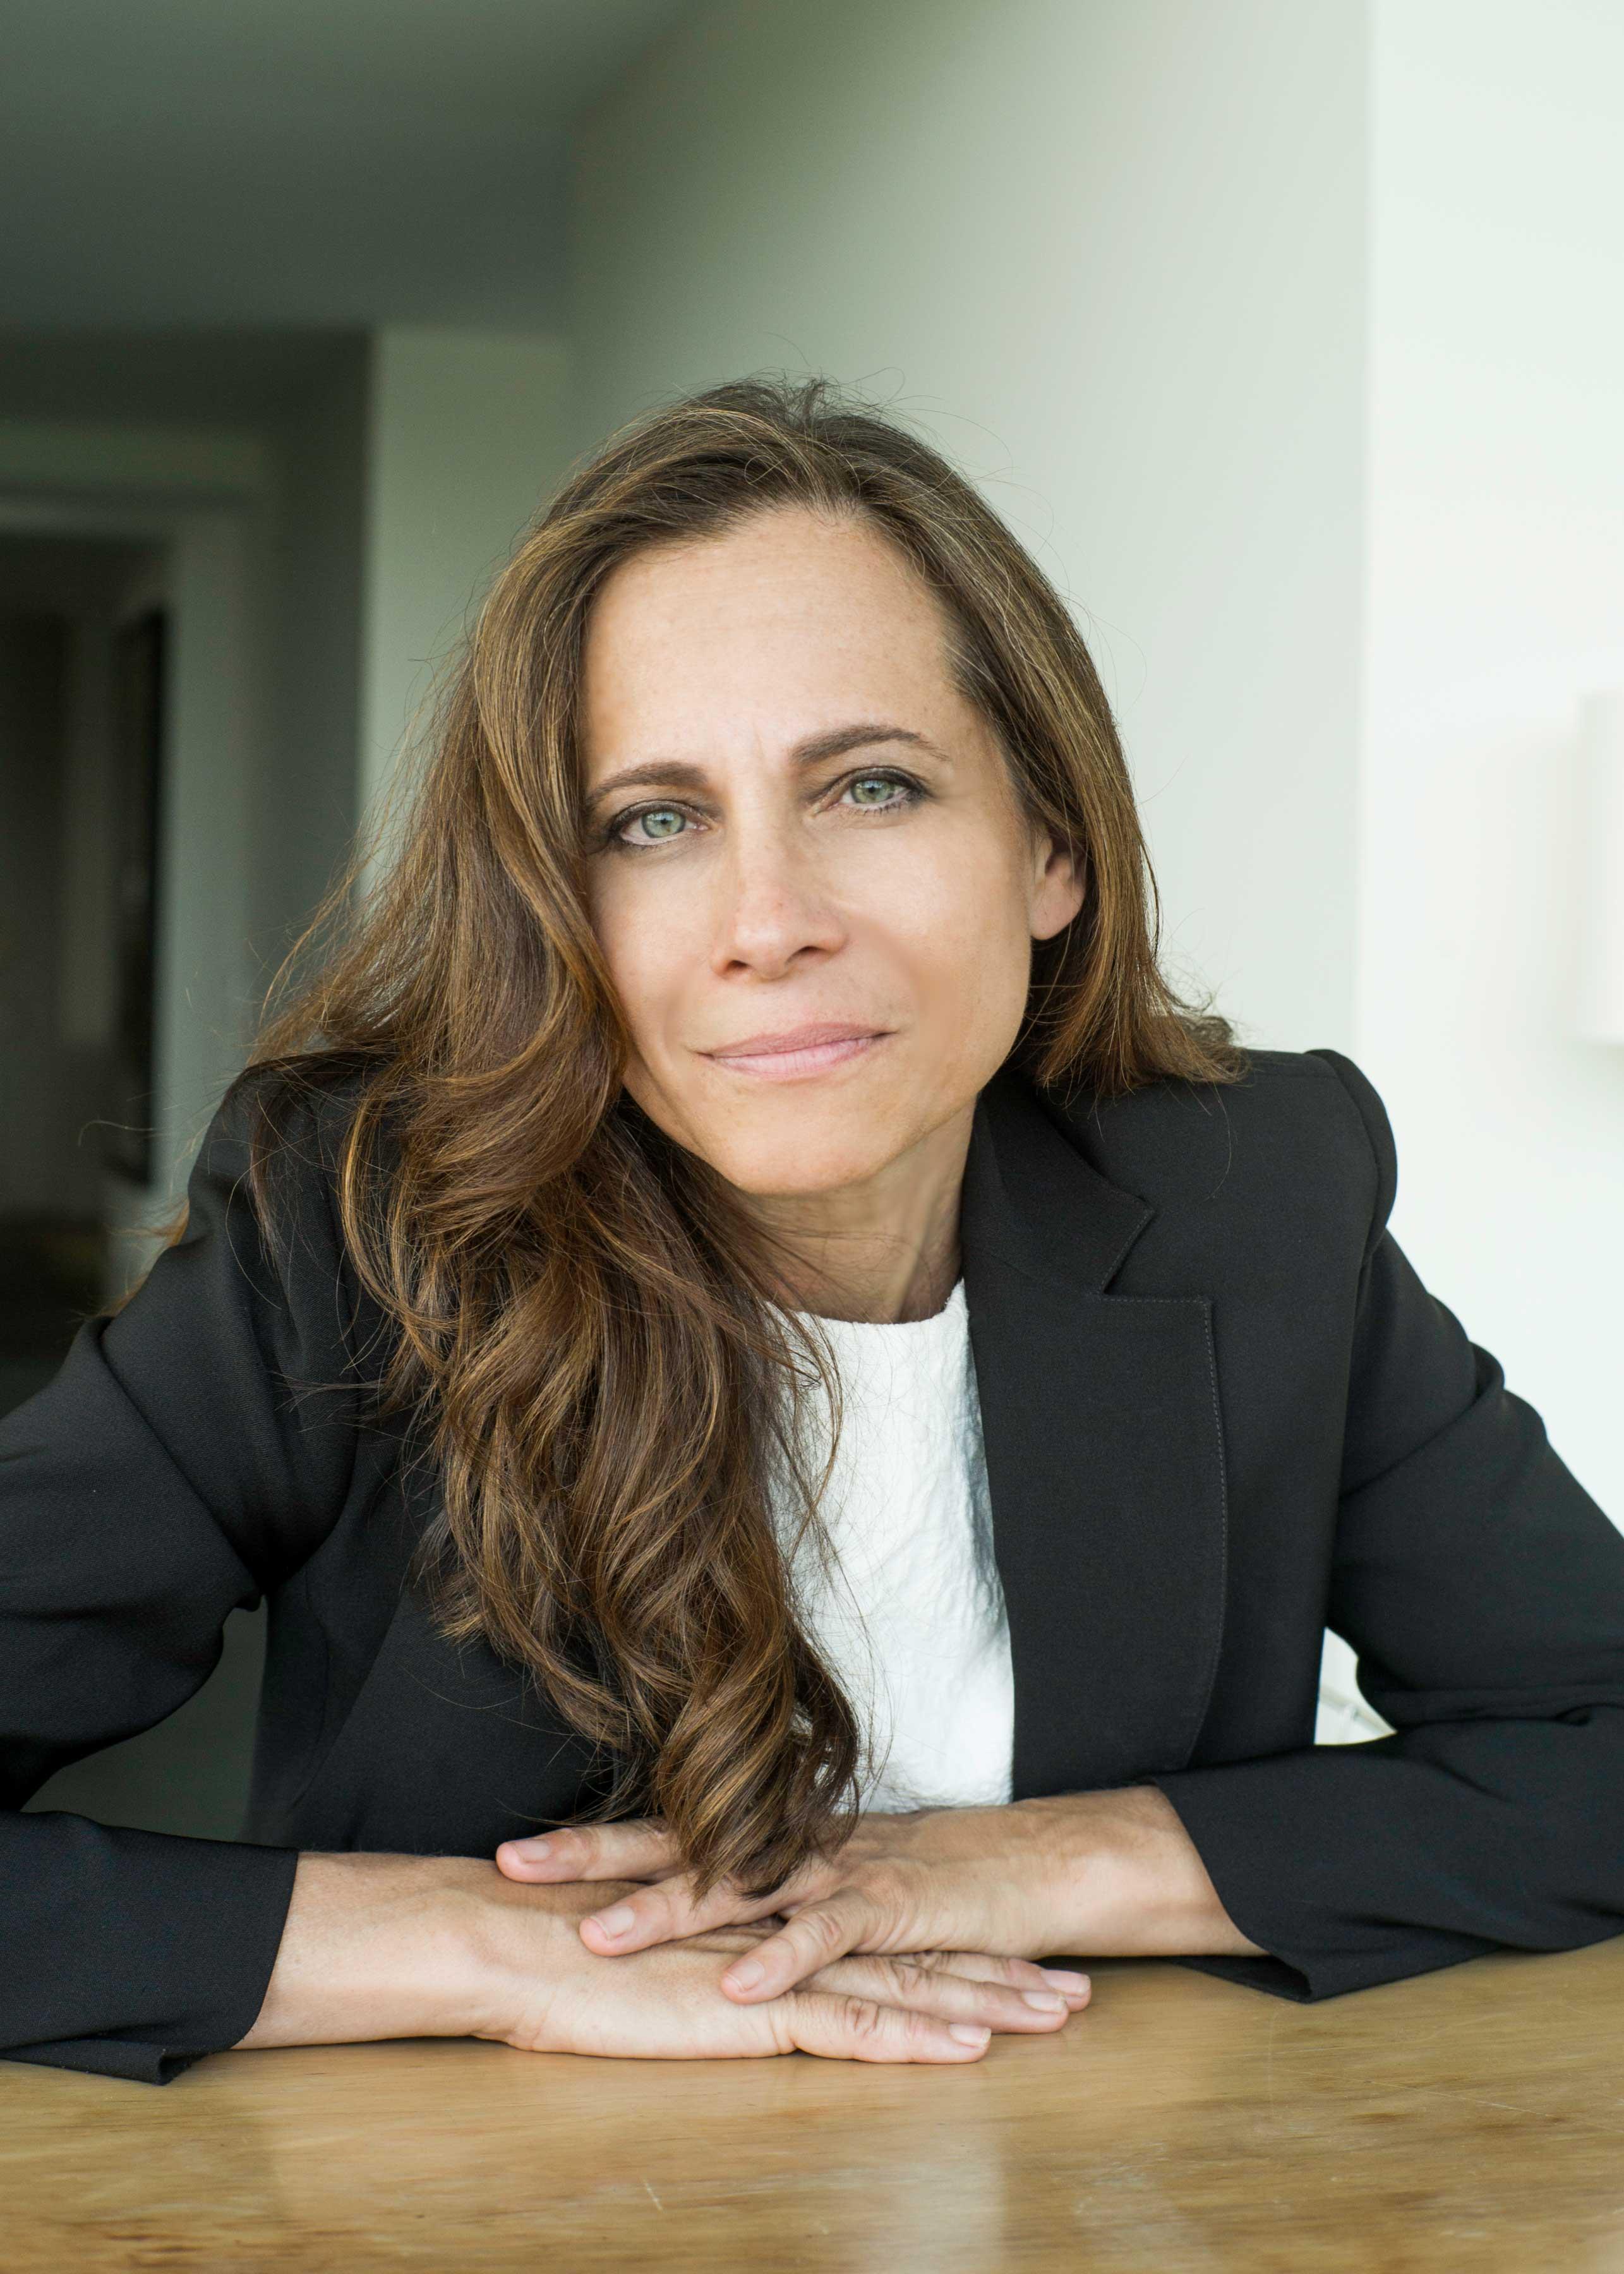 Jessica Helfand, author of The Invention of Desire